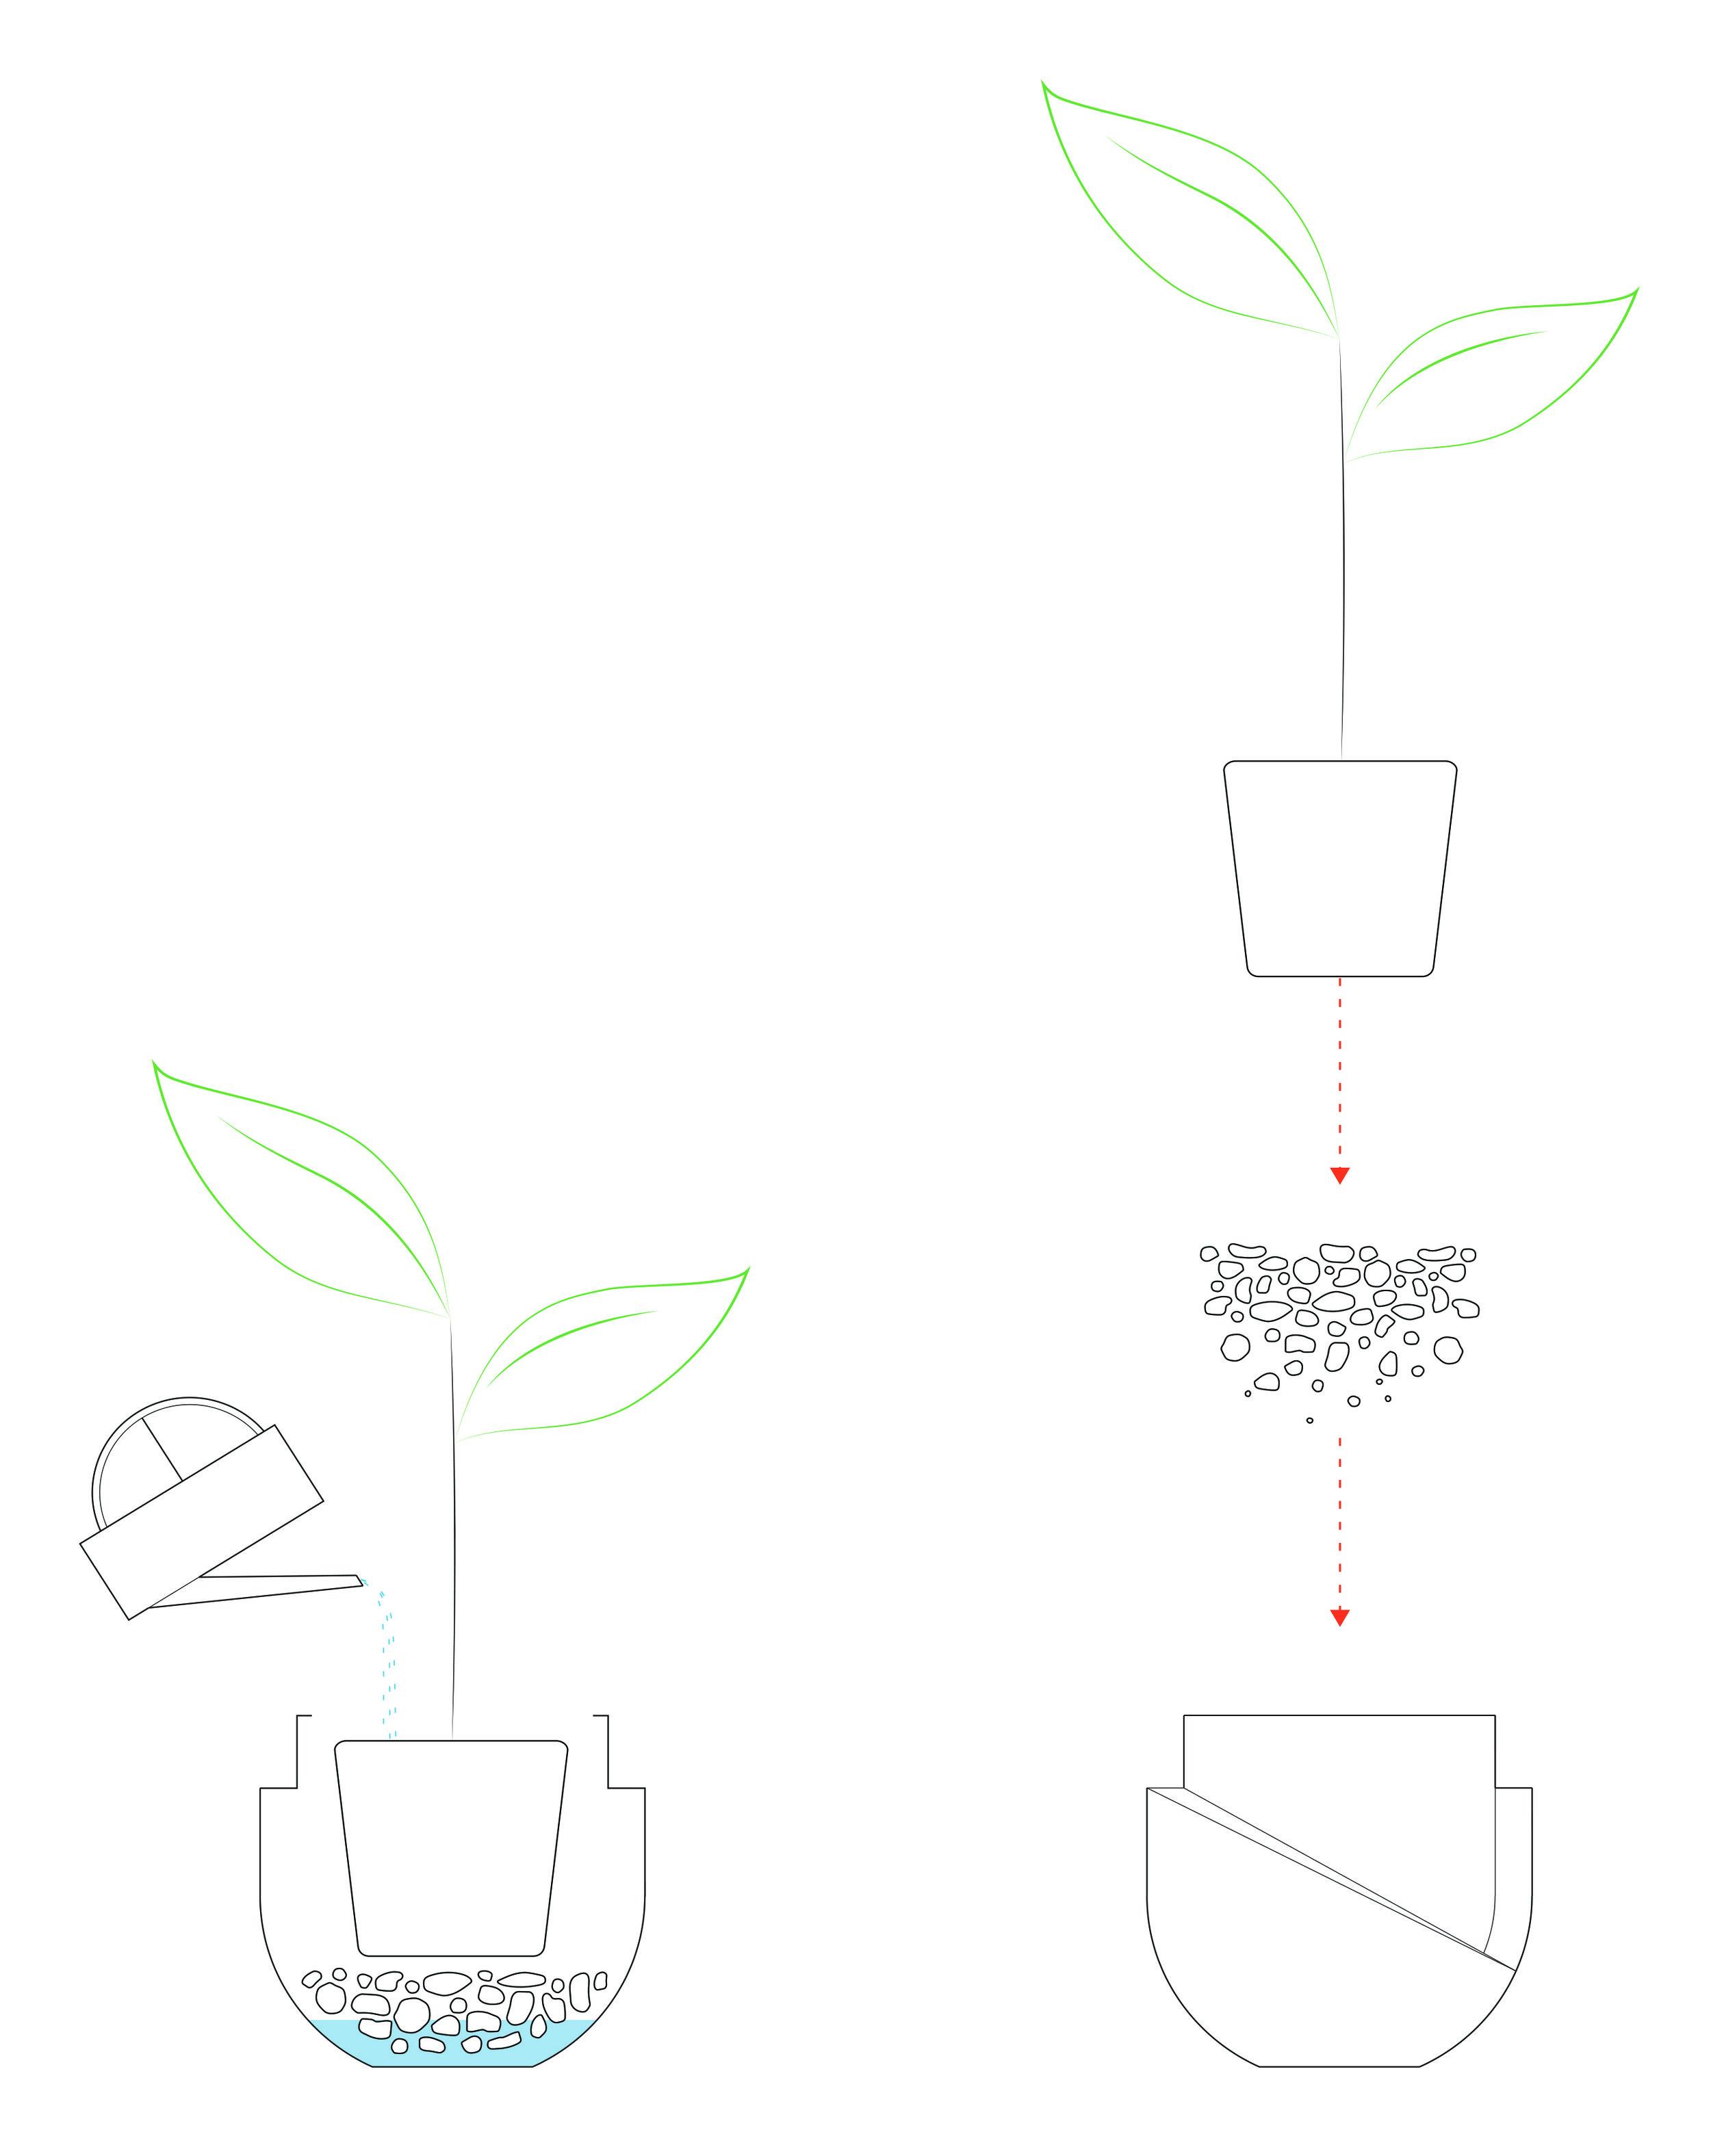 L+L_GRAPHICS-7.jpg